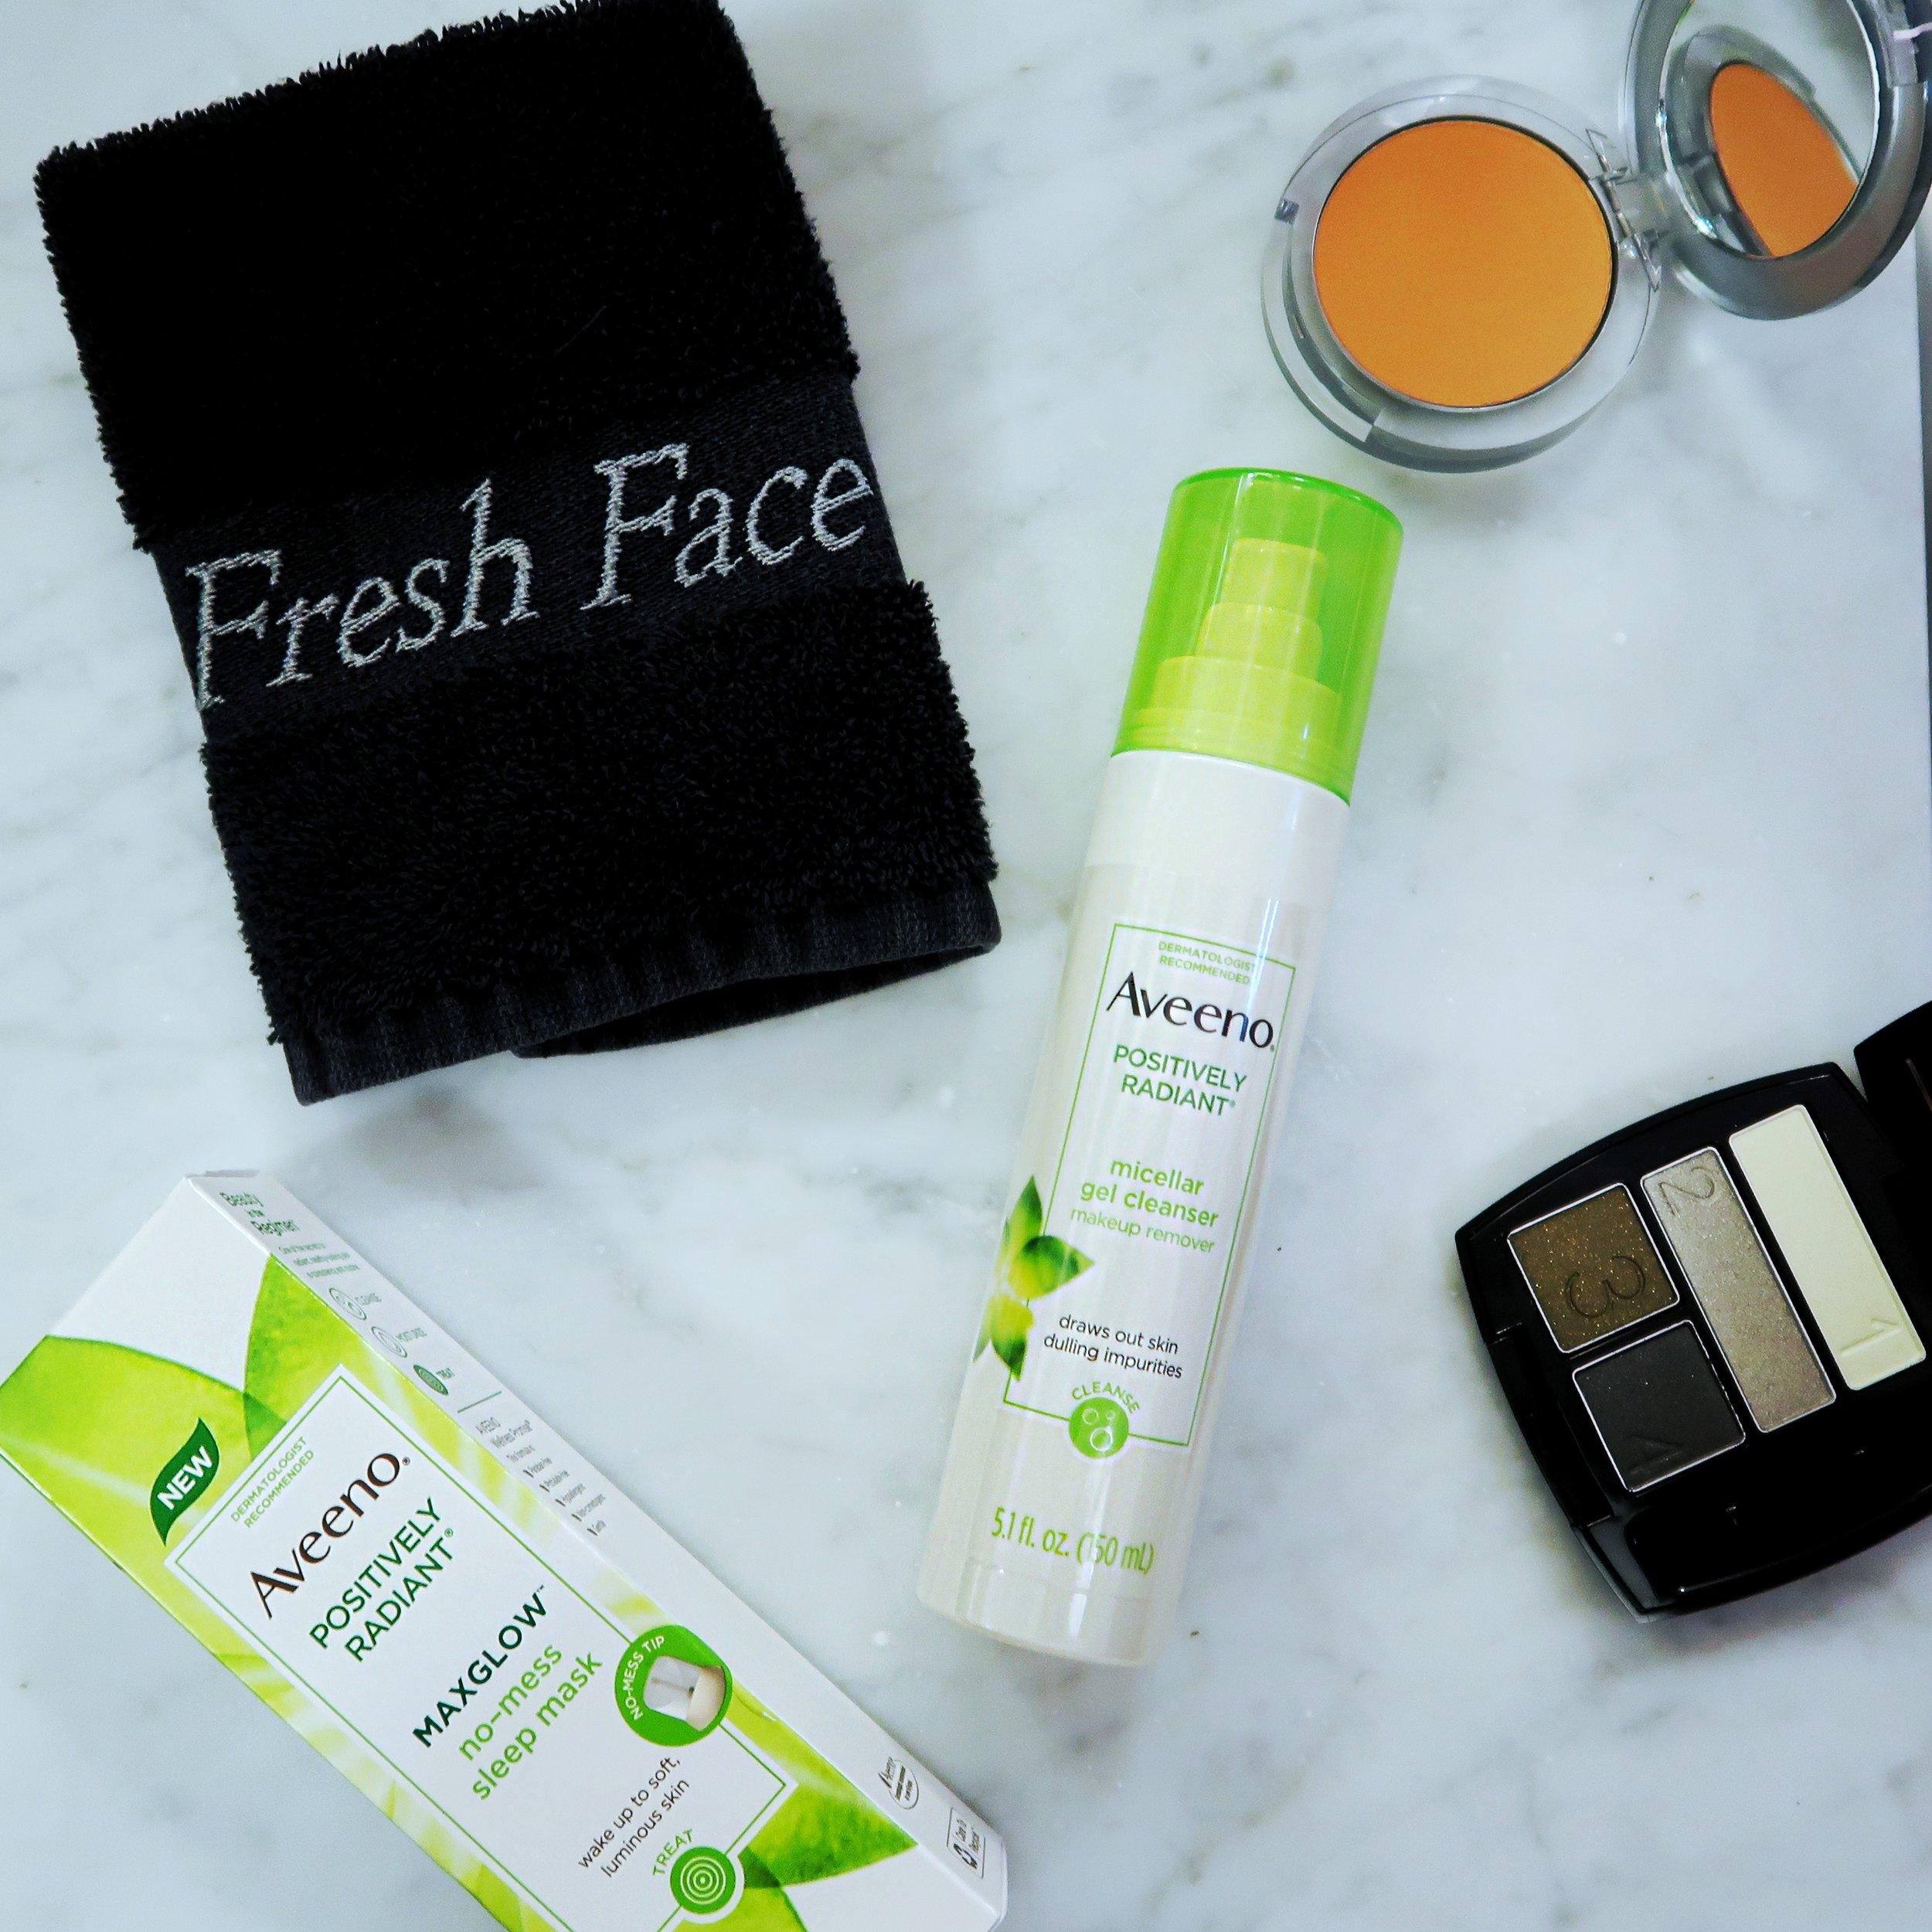 Aveeno Positively Radiant Beauty Products